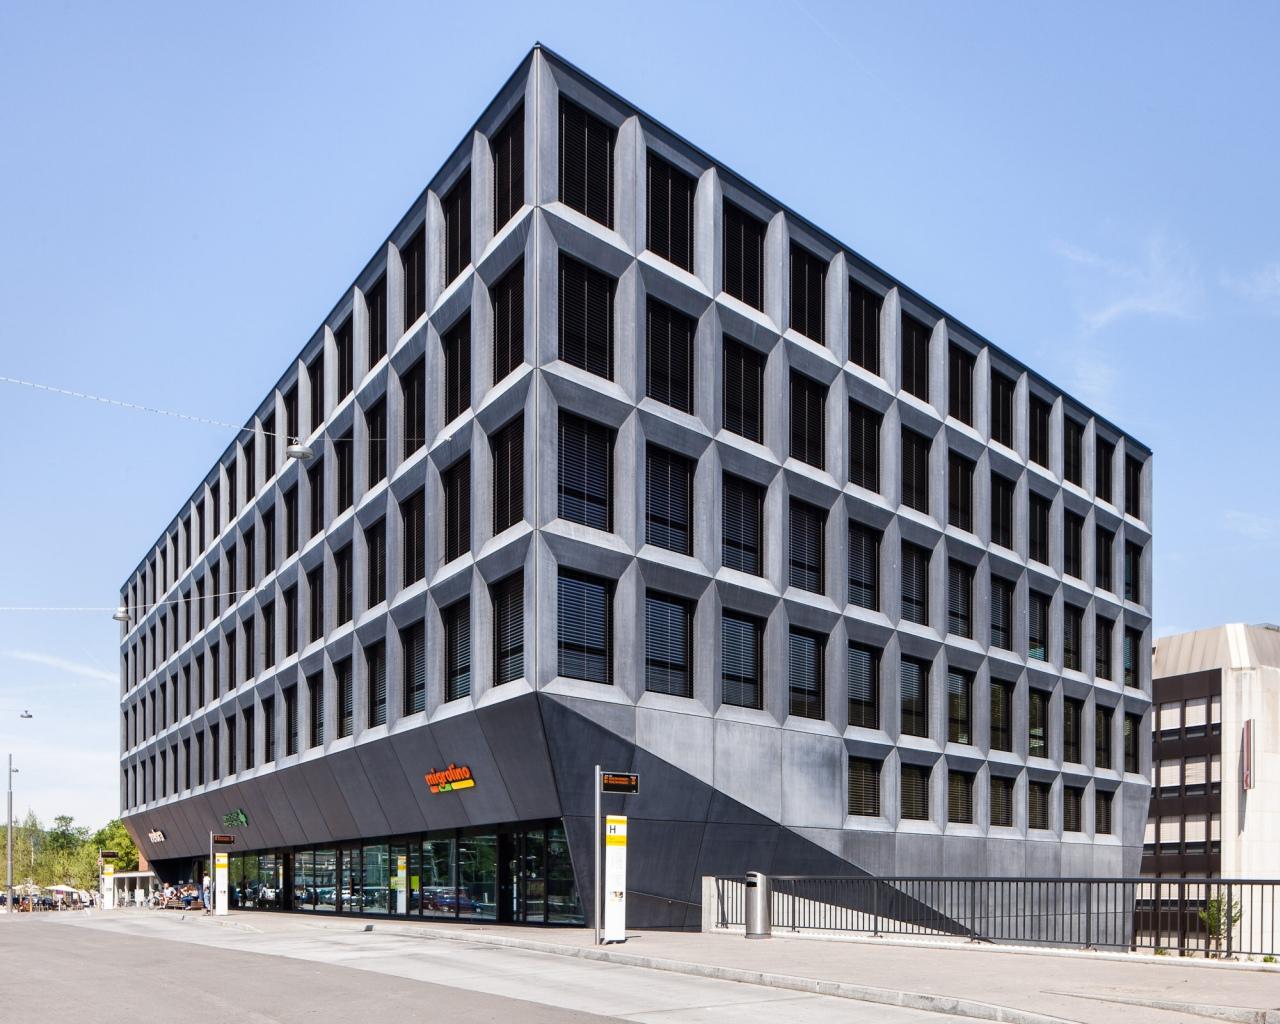 Office Building in Liestal / Christ & Gantenbein, © Roman Keller